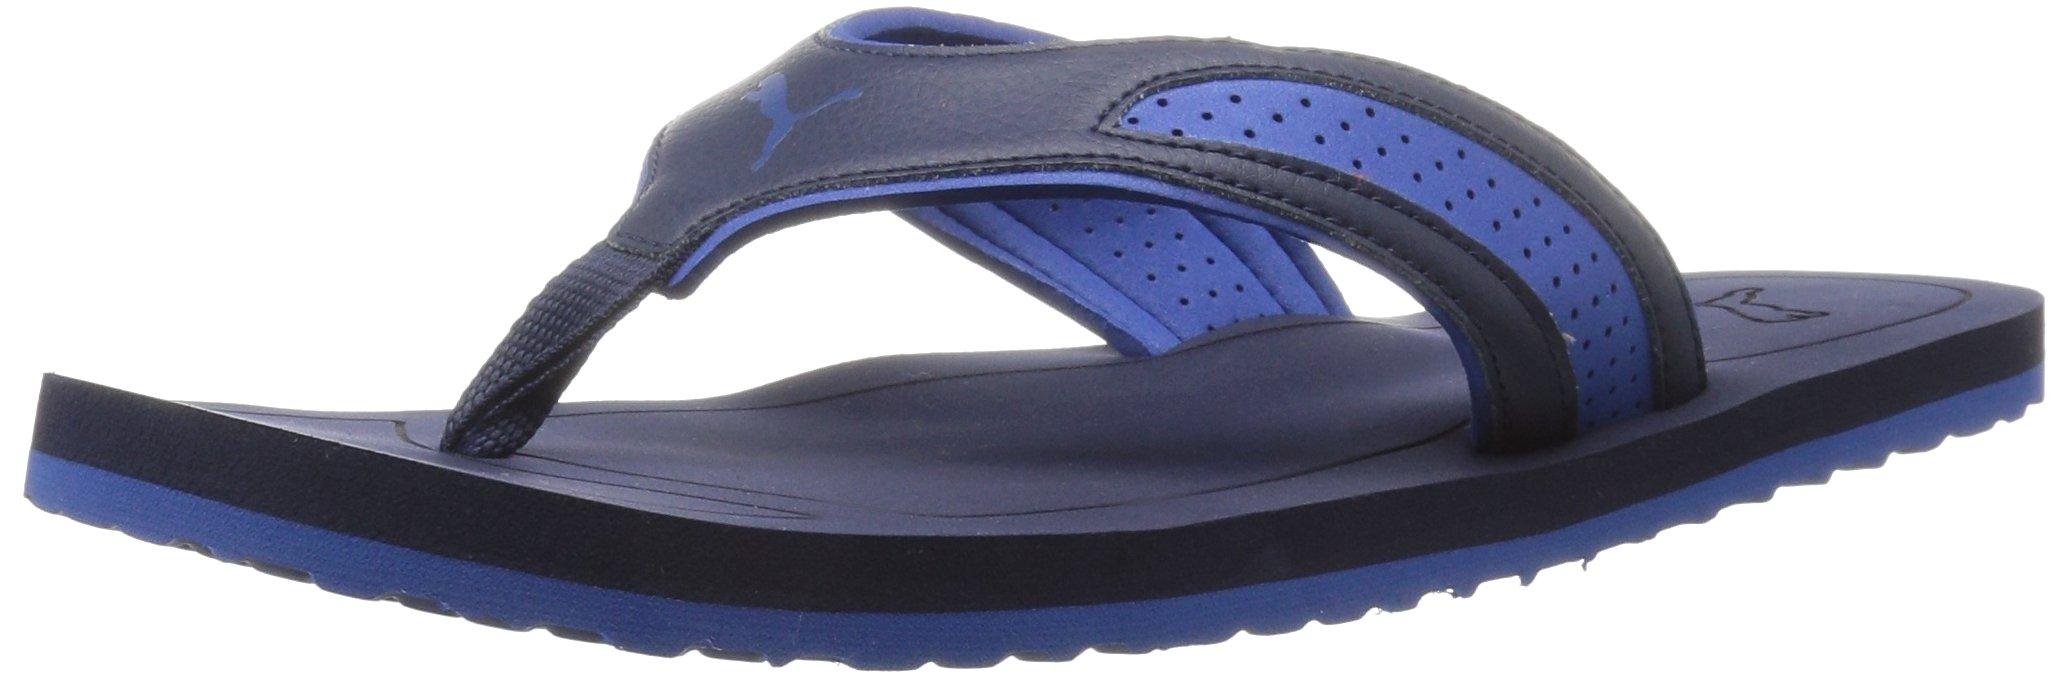 PUMA Men's Epic Flip V2 Tech Athletic Sandal, Peacoat-True Blue, 5 M US